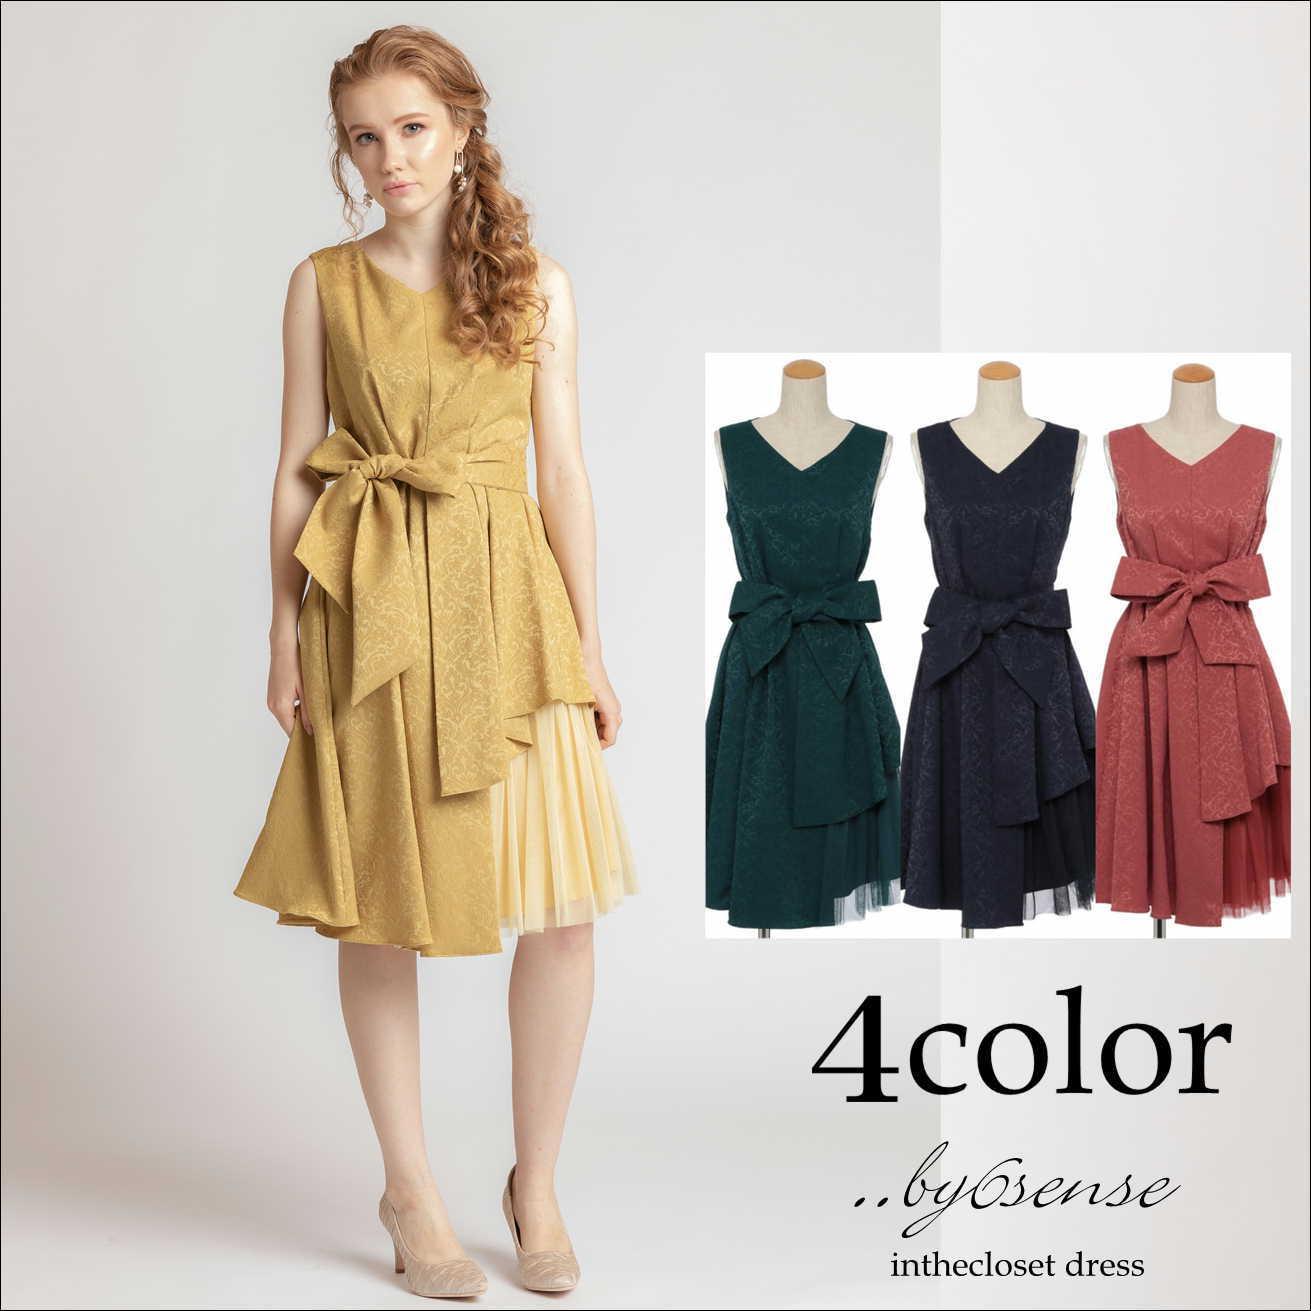 4color(イエロー)サッシュベルト付き裾アシメレースミドル丈ジャガードワンピース  DorryDoll(ドリードールドレス)